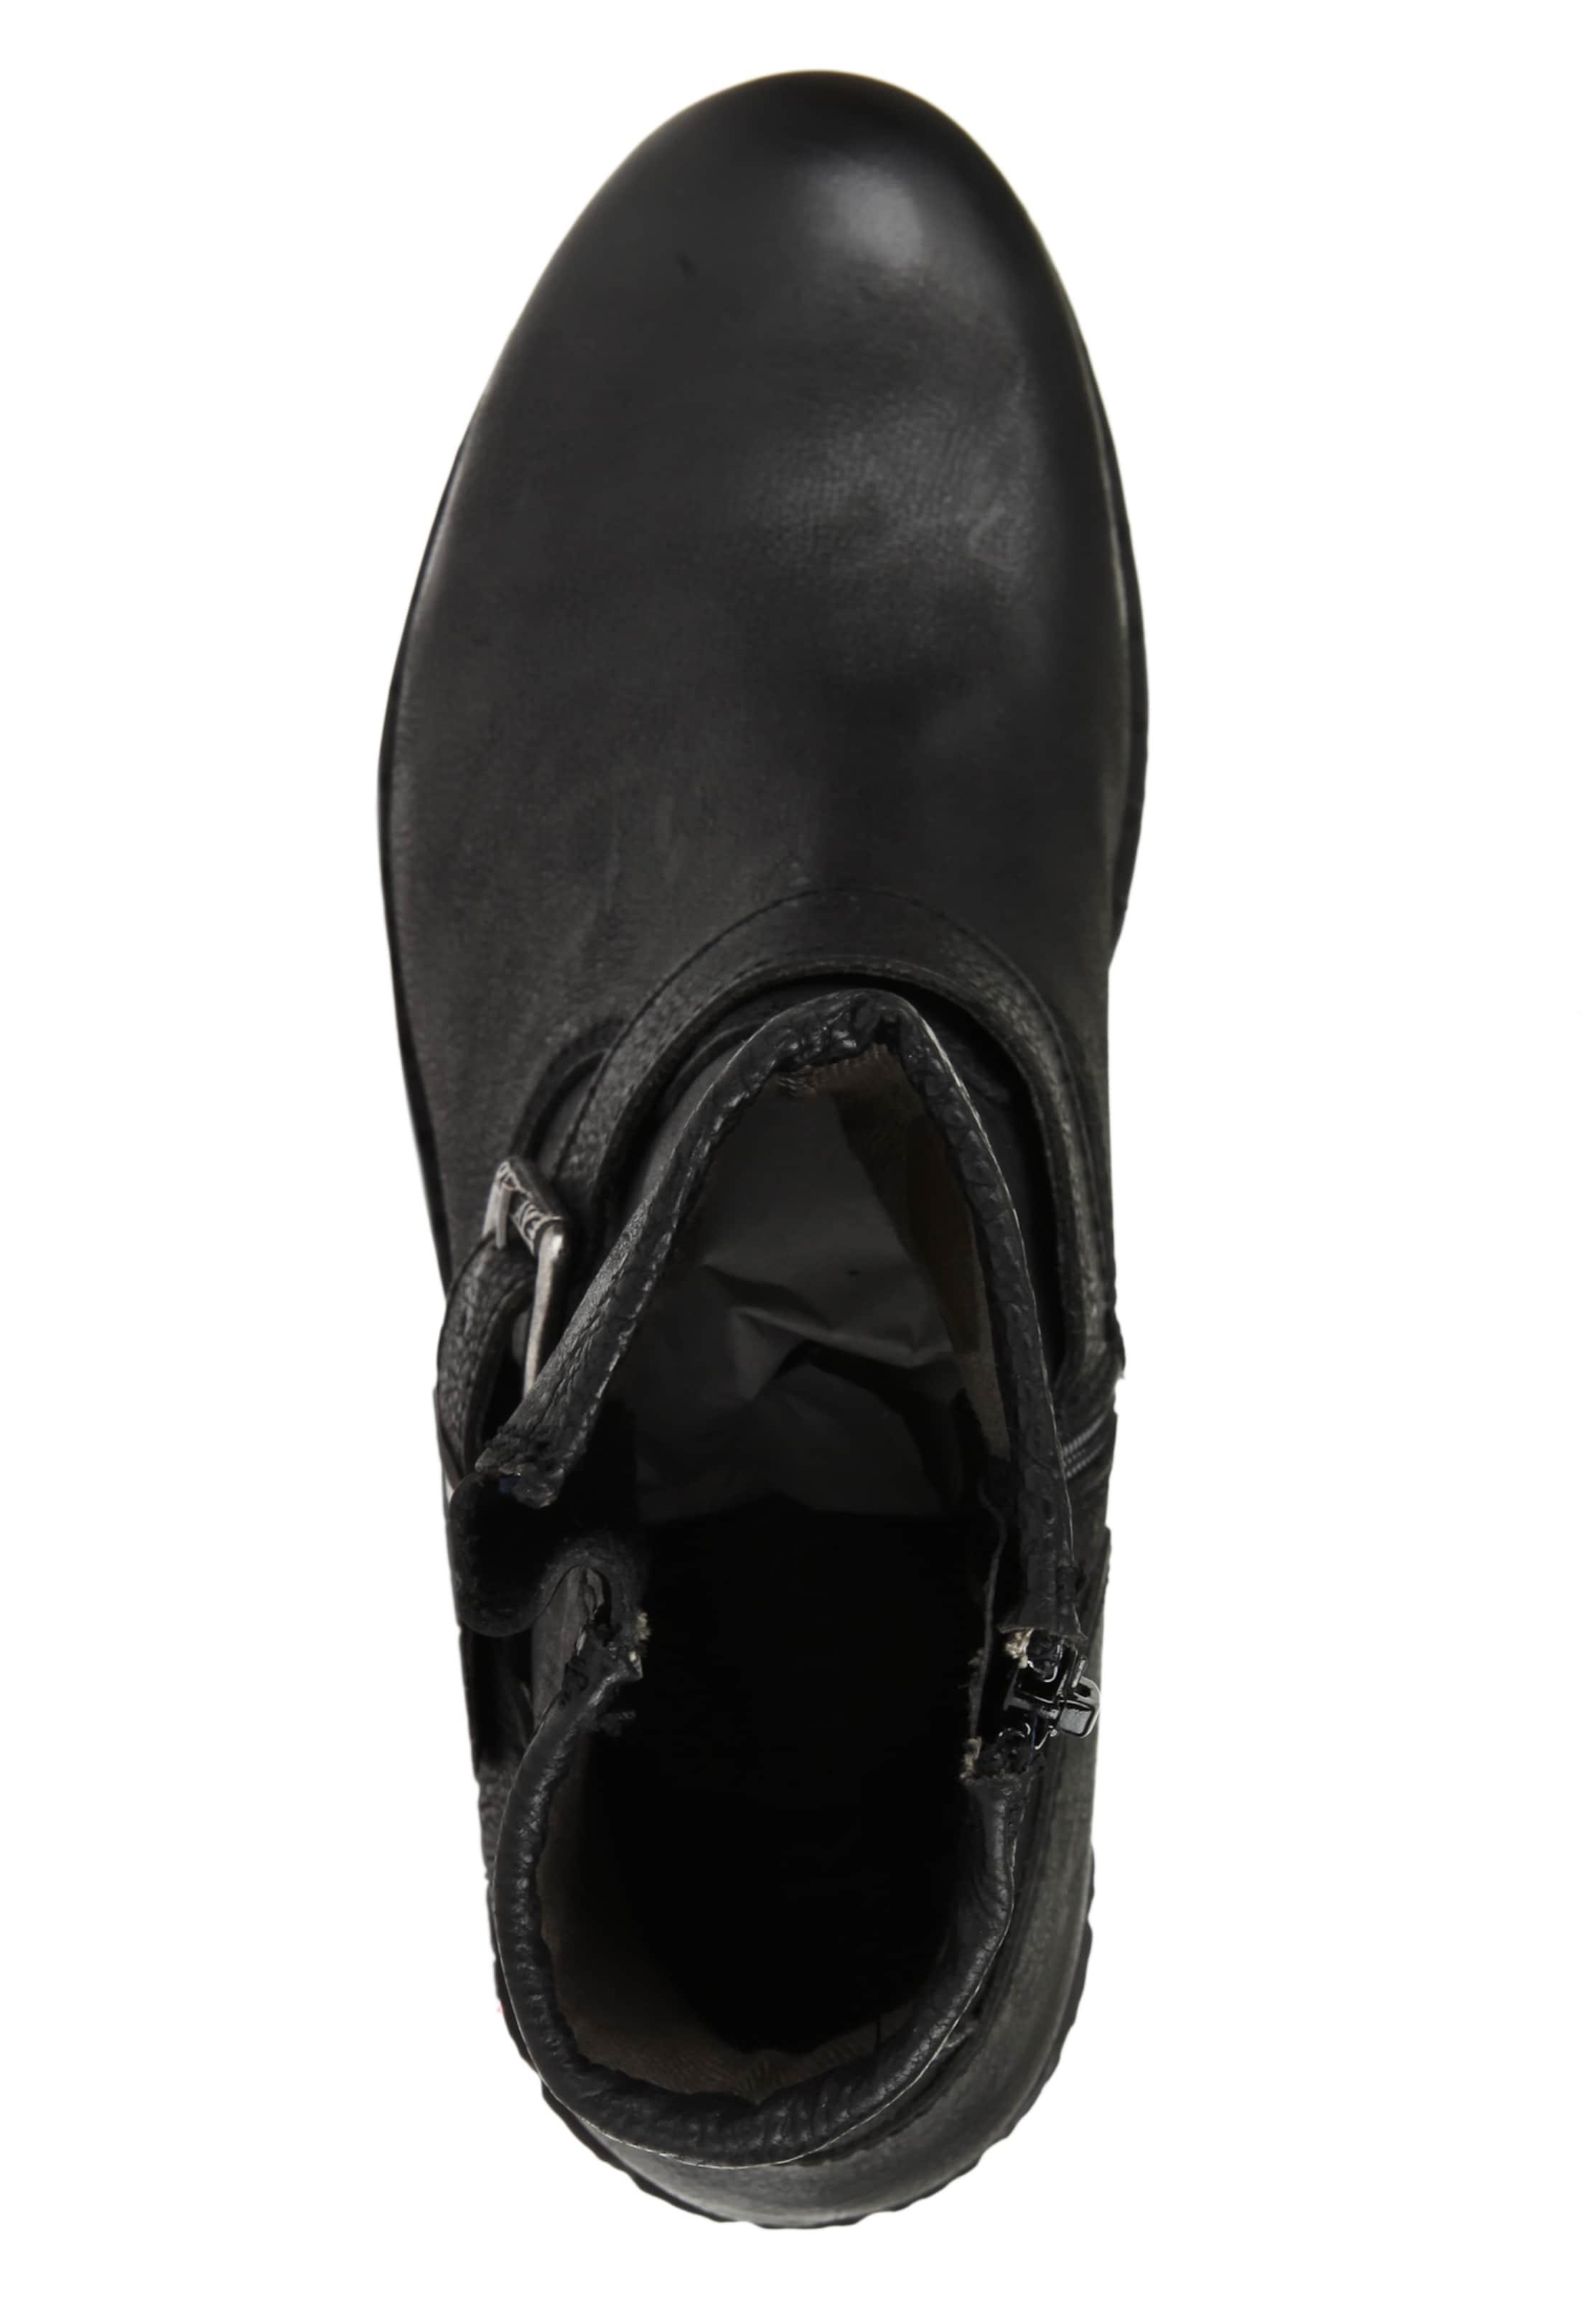 REPLAY Stiefel 'CAPTAIN Leder Leder Leder Billige Herren- und Damenschuhe c9e5f6